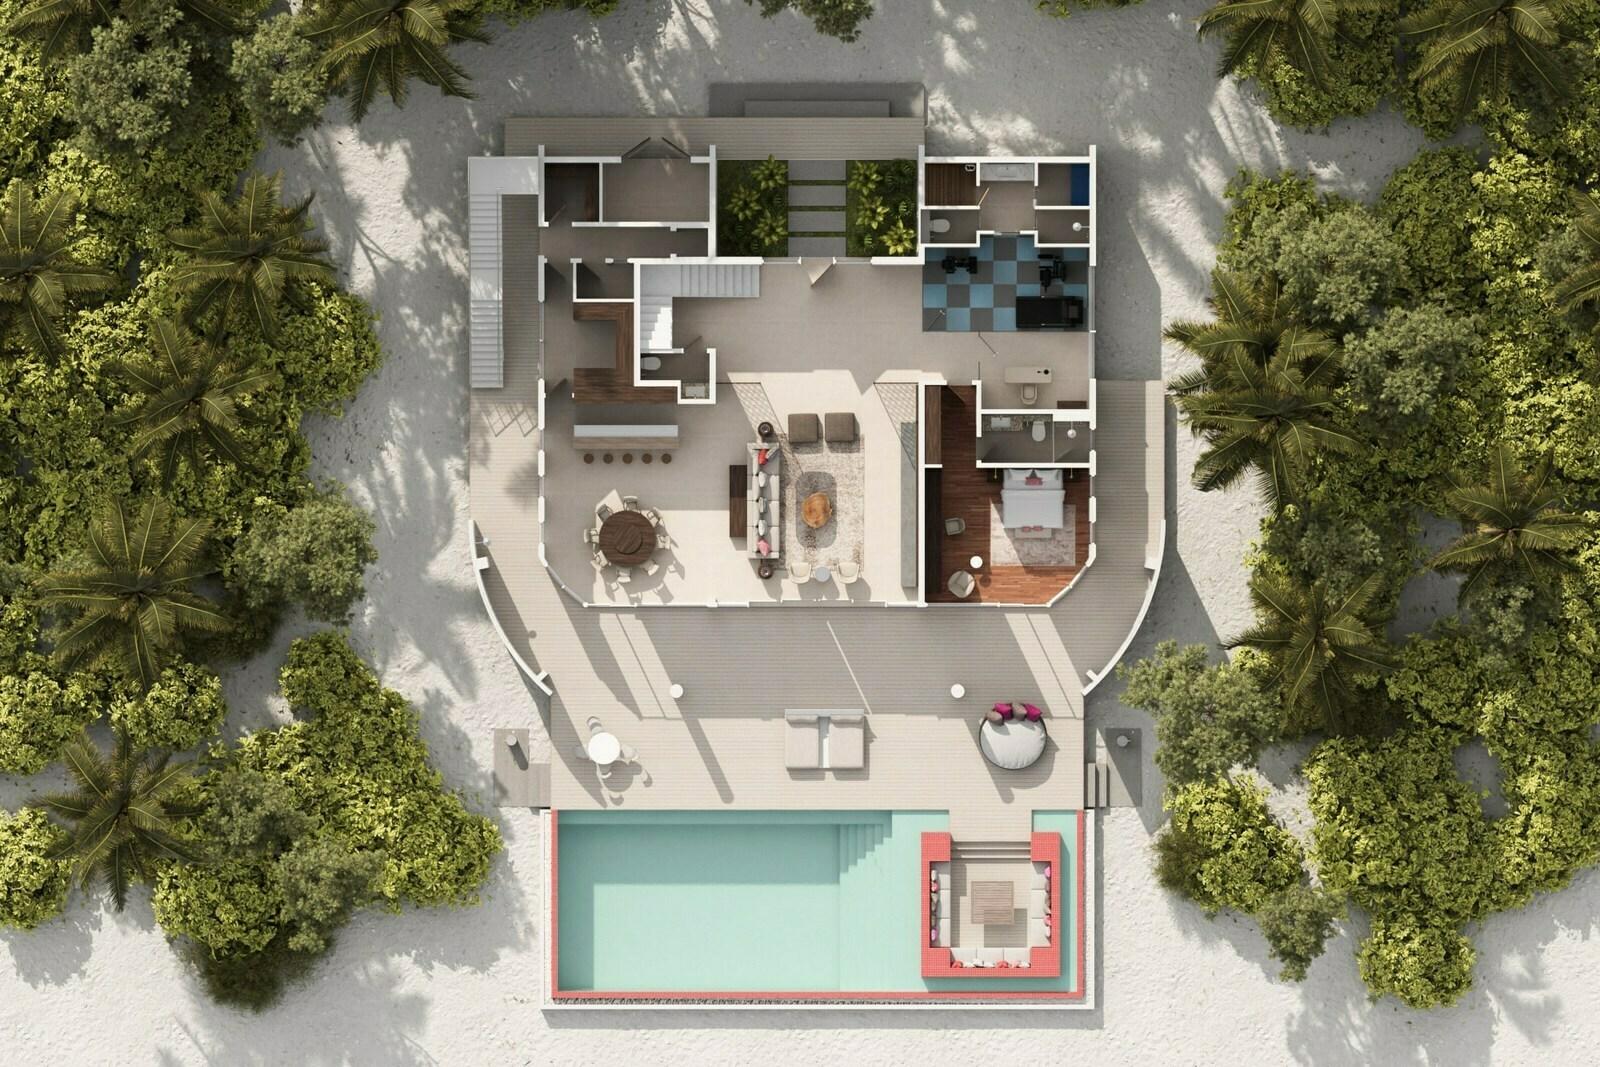 Мальдивы, отель LUX North Male Atoll, план-схема номера LUX Beach Retreat 3 Bedroom